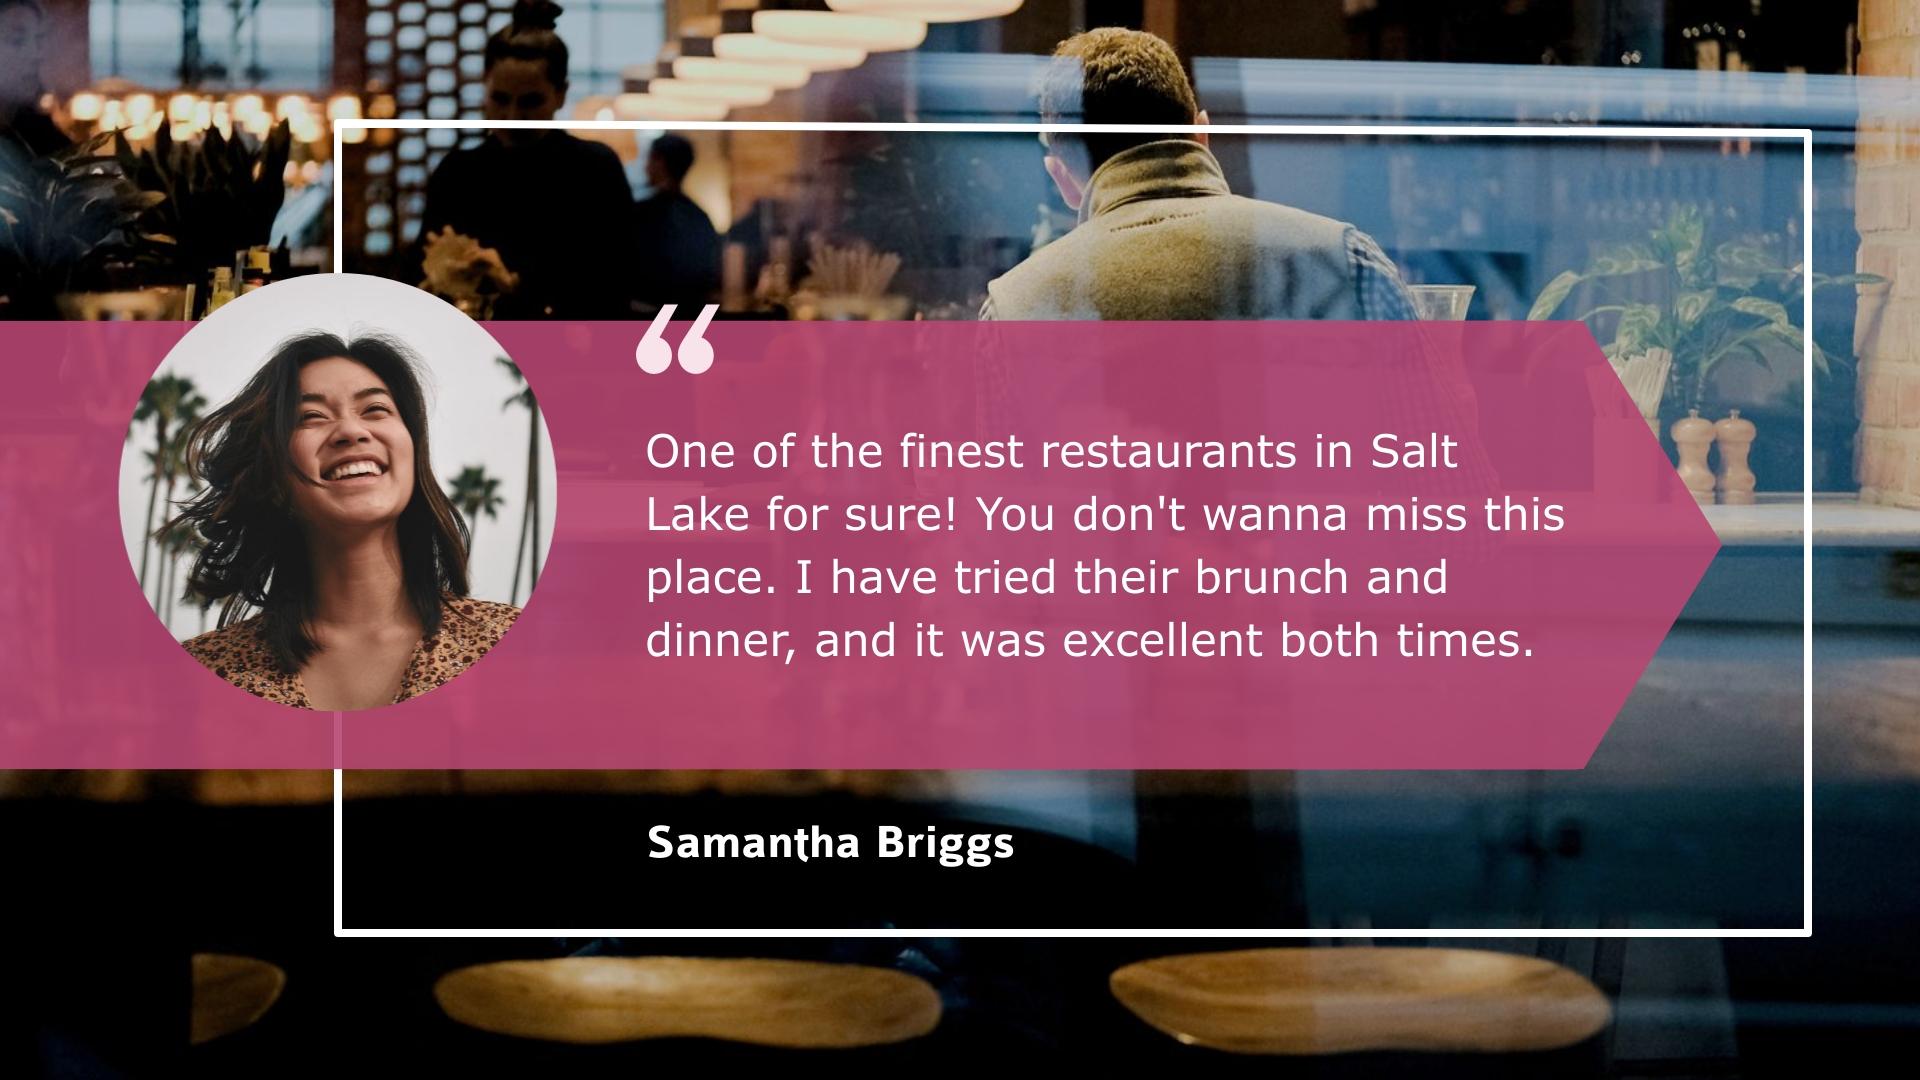 Restaurant - Video Testimonial Template